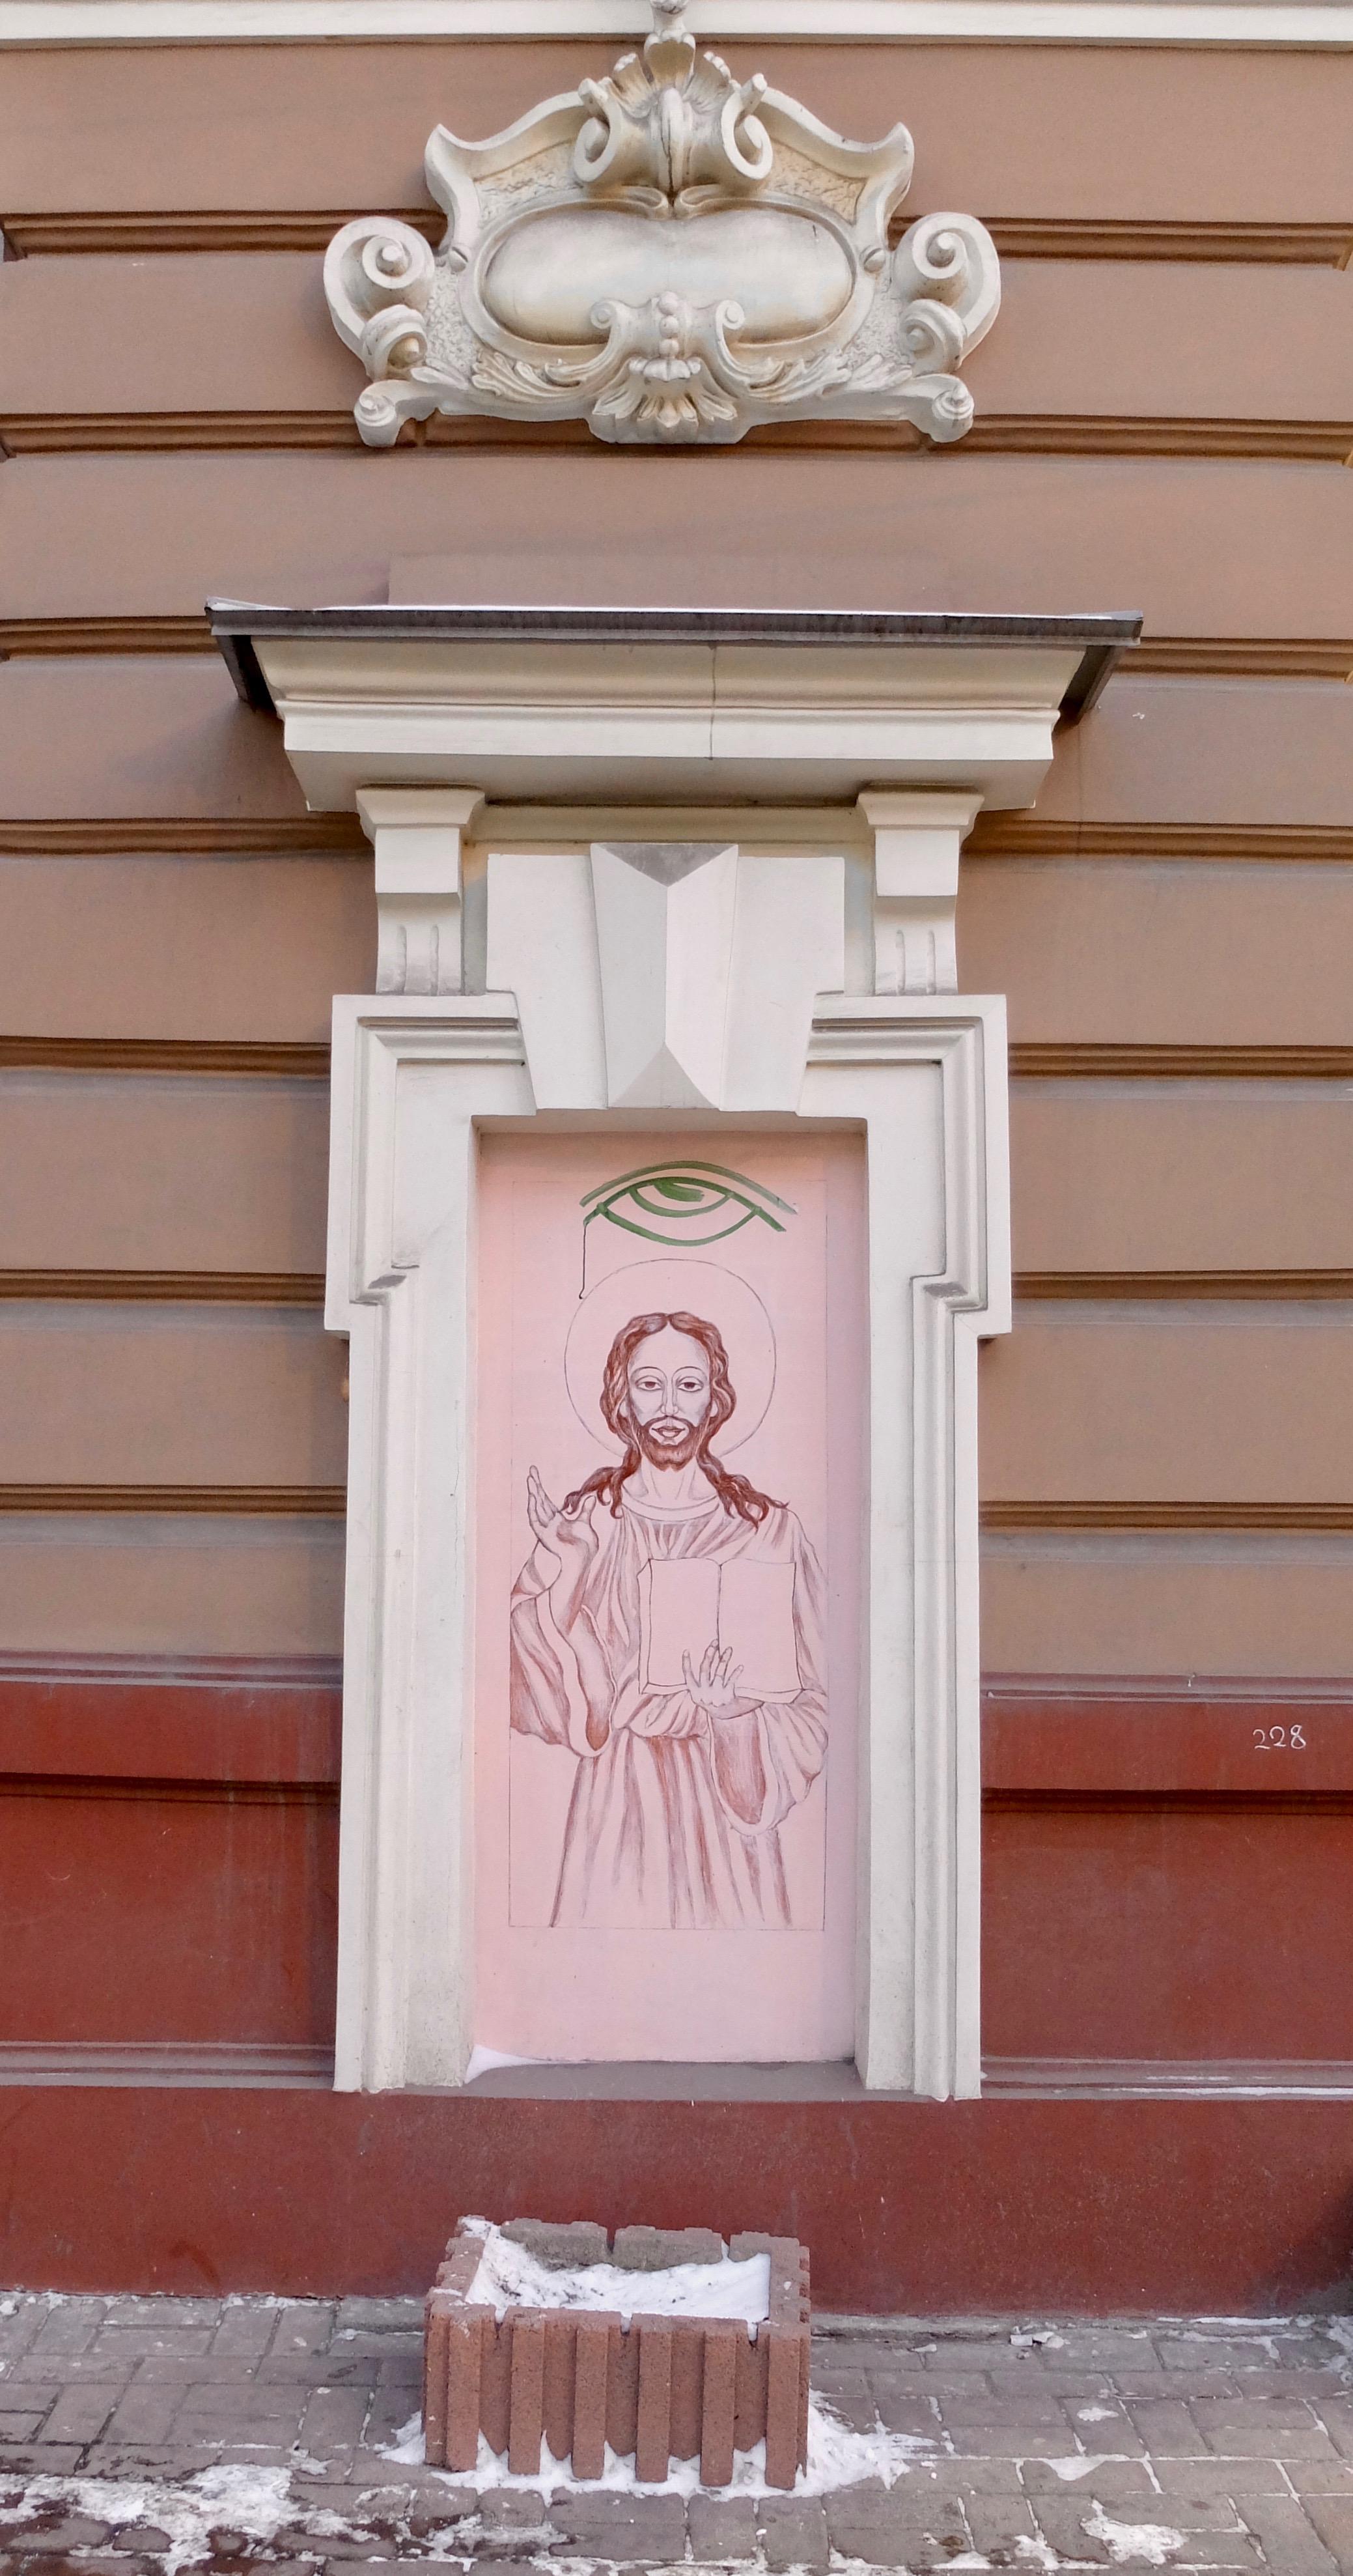 Irkutsk Graffiti Jesus would very much like everyone to just be kind.